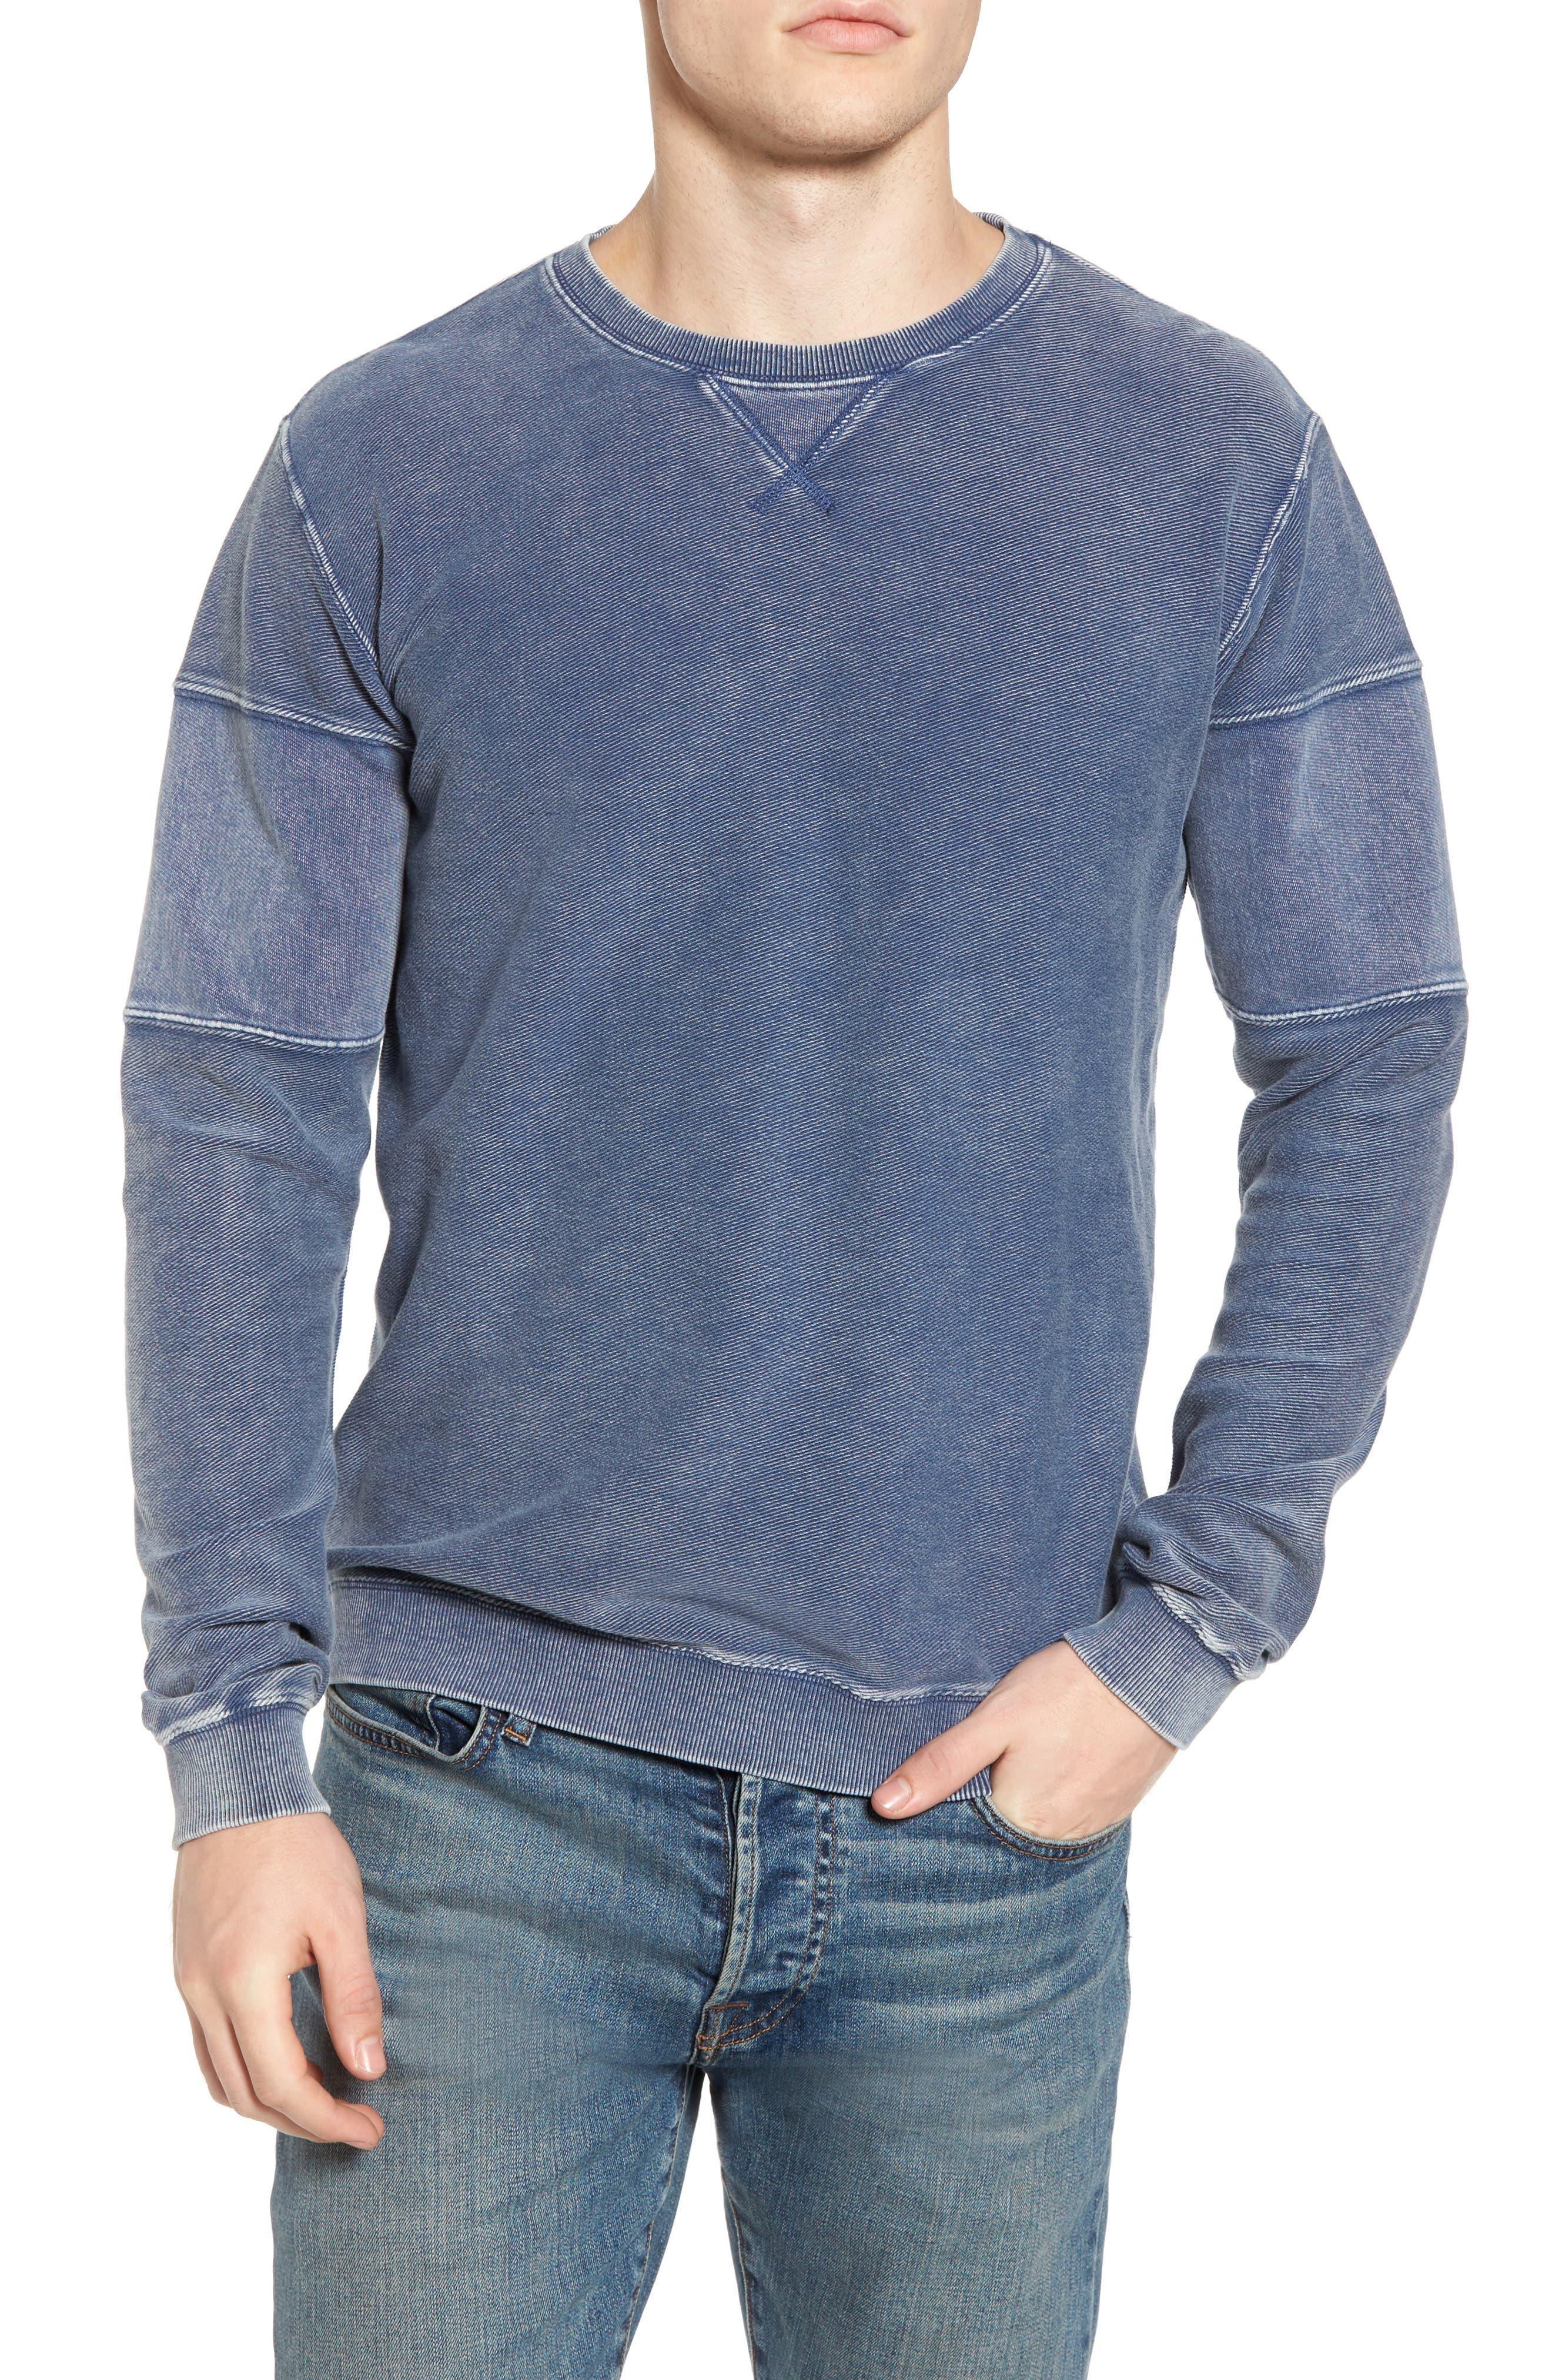 Alternate Image 1 Selected - RVCA Distressed Sweatshirt